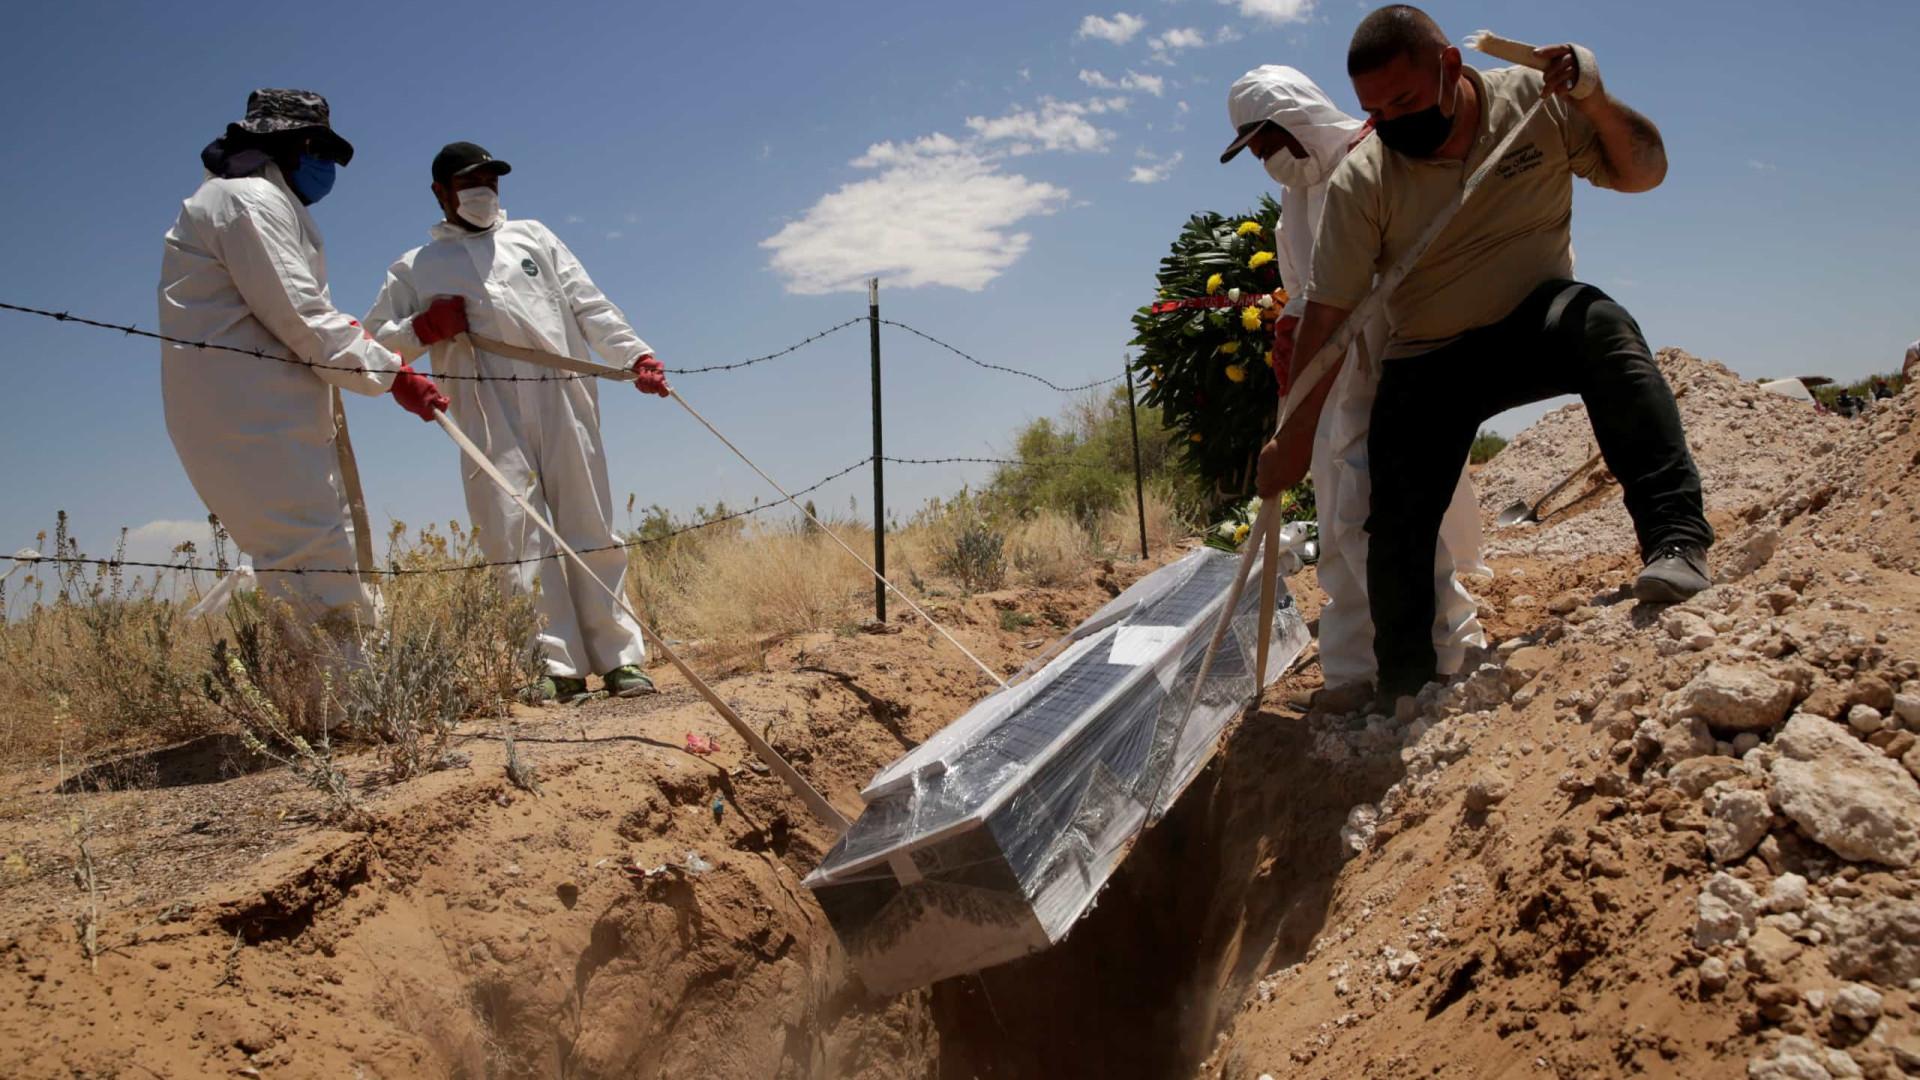 Mortes por covid-19 no Brasil podem bater 88,3 mil em agosto